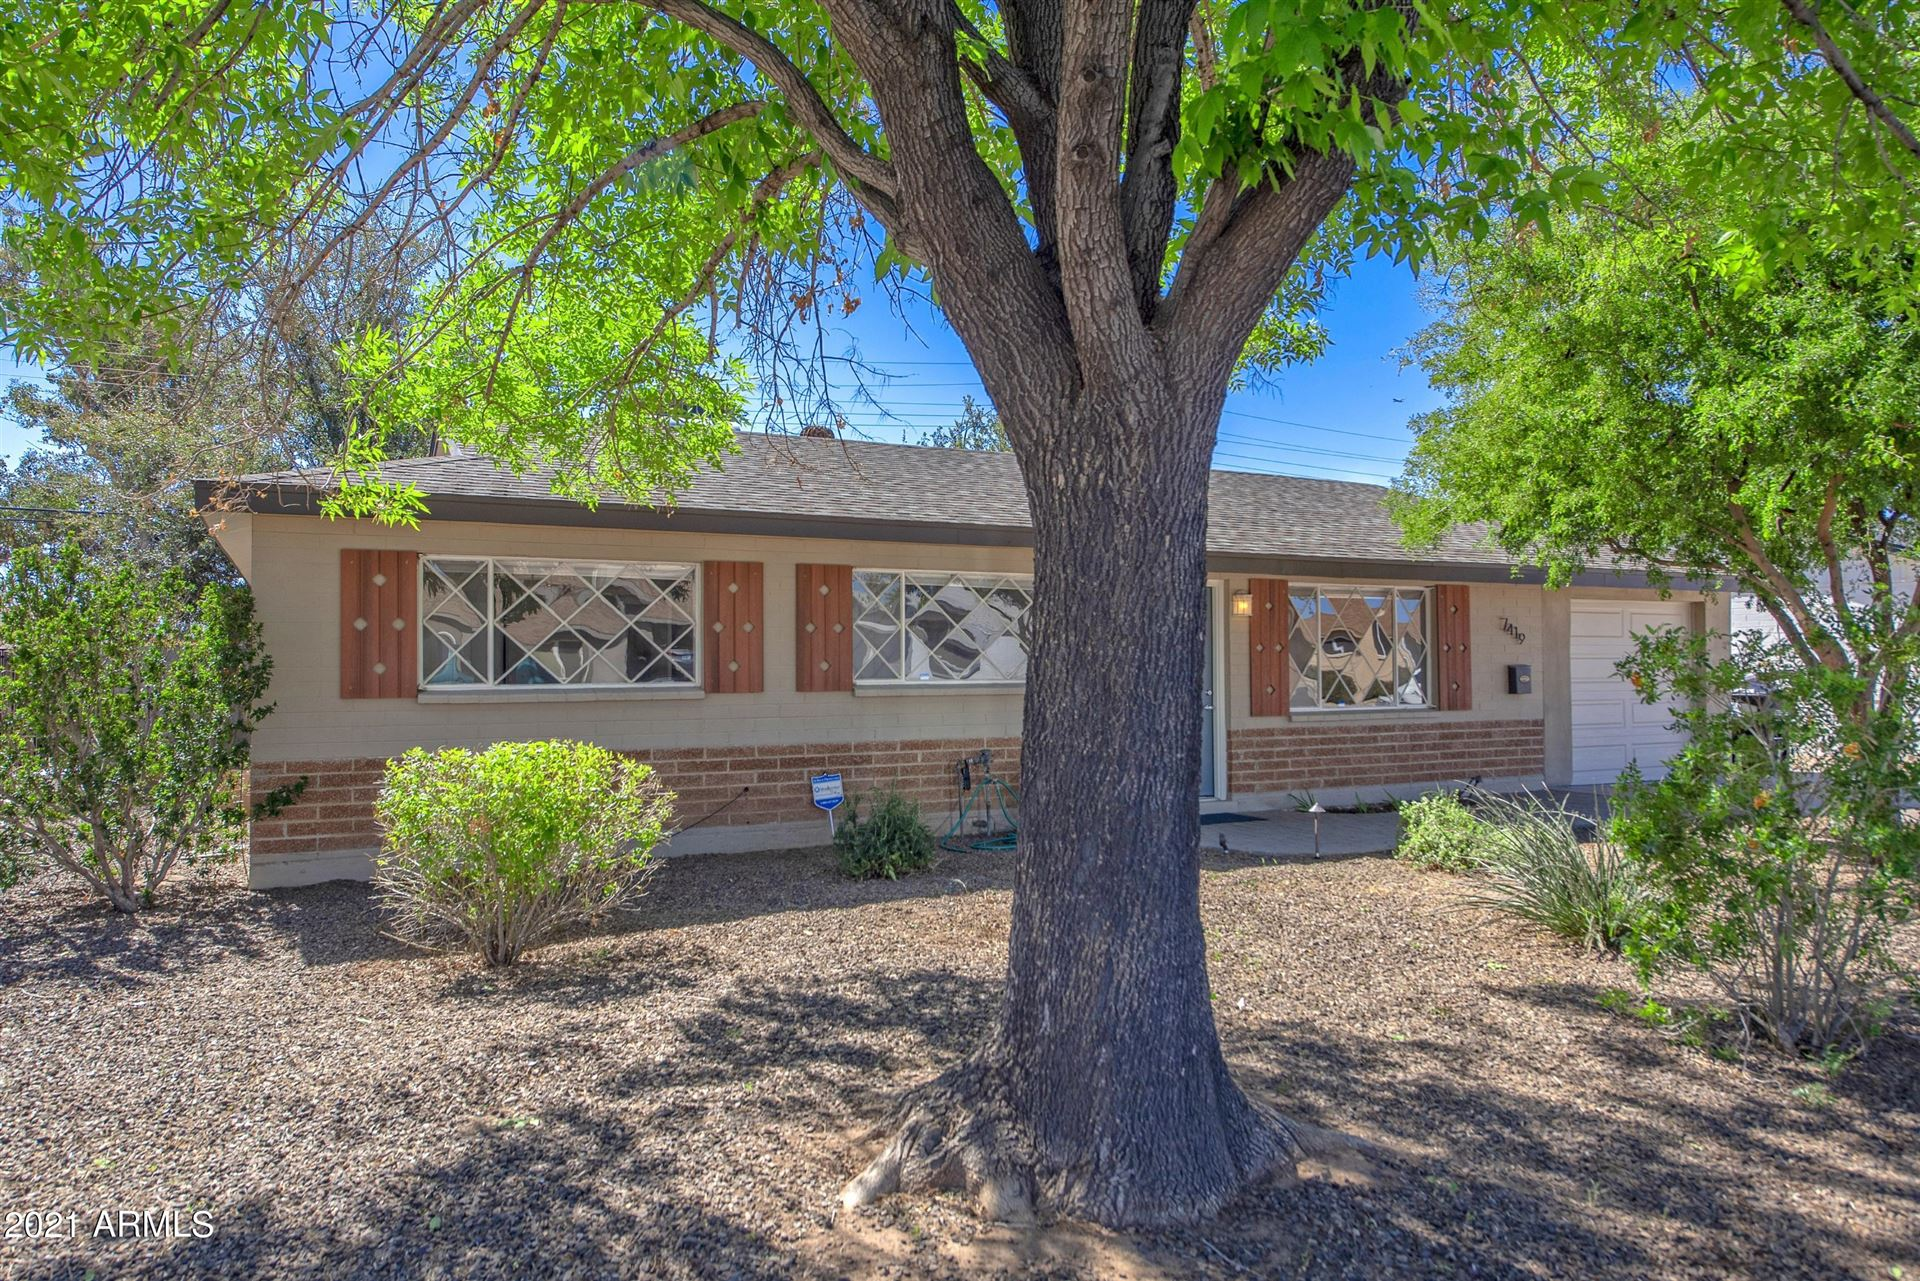 Photo of 7419 E FILLMORE Street, Scottsdale, AZ 85257 (MLS # 6201584)